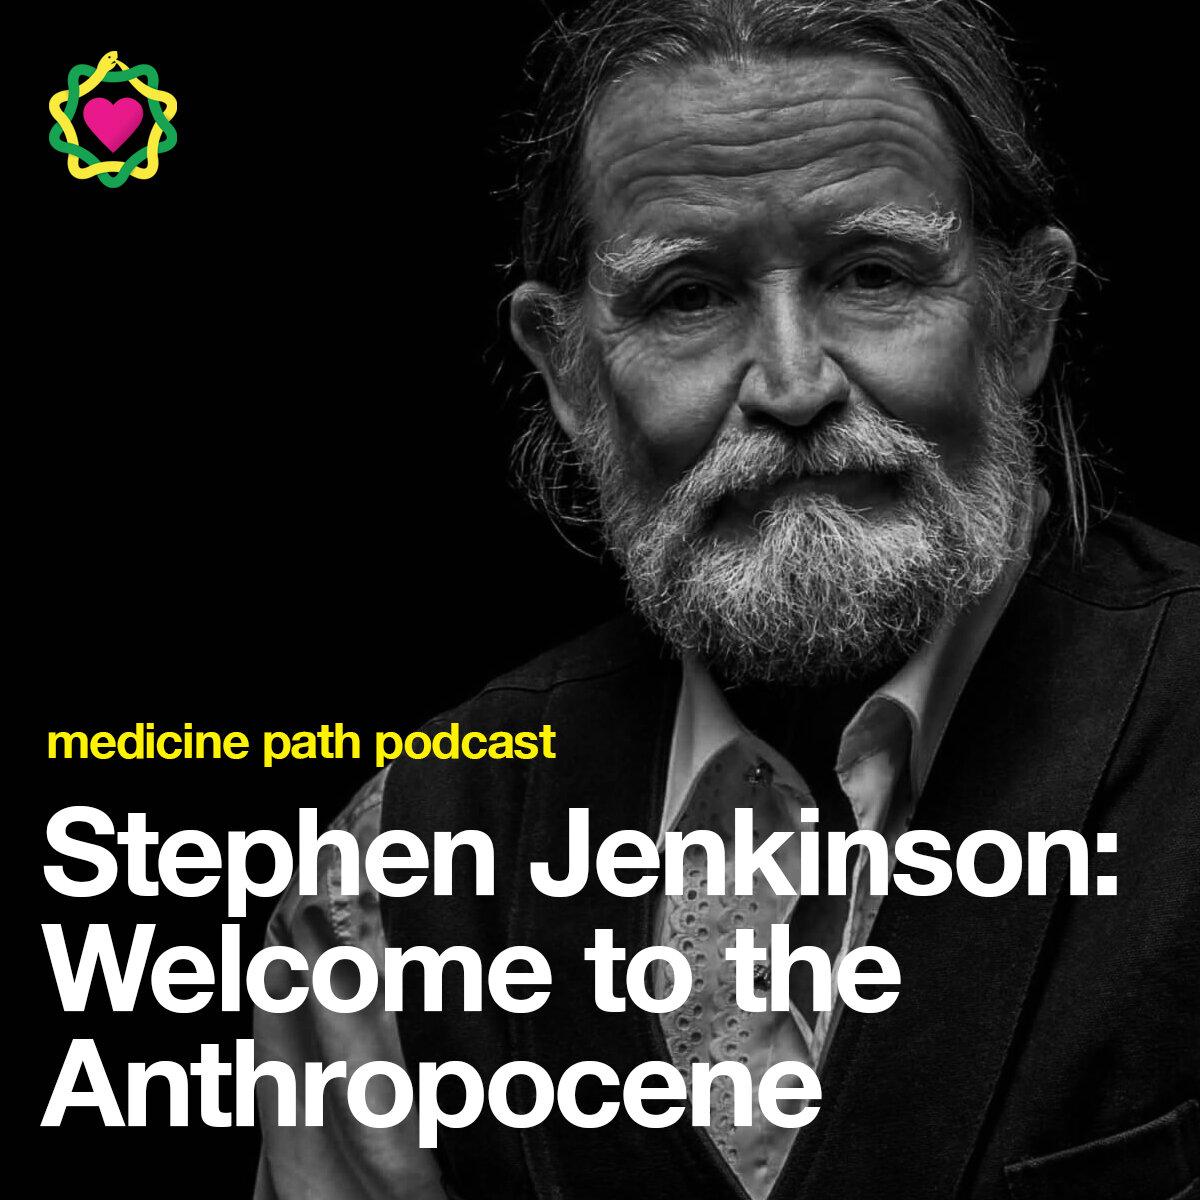 MPP69 Stephen Jenkinson: Welcome to the Anthropocene